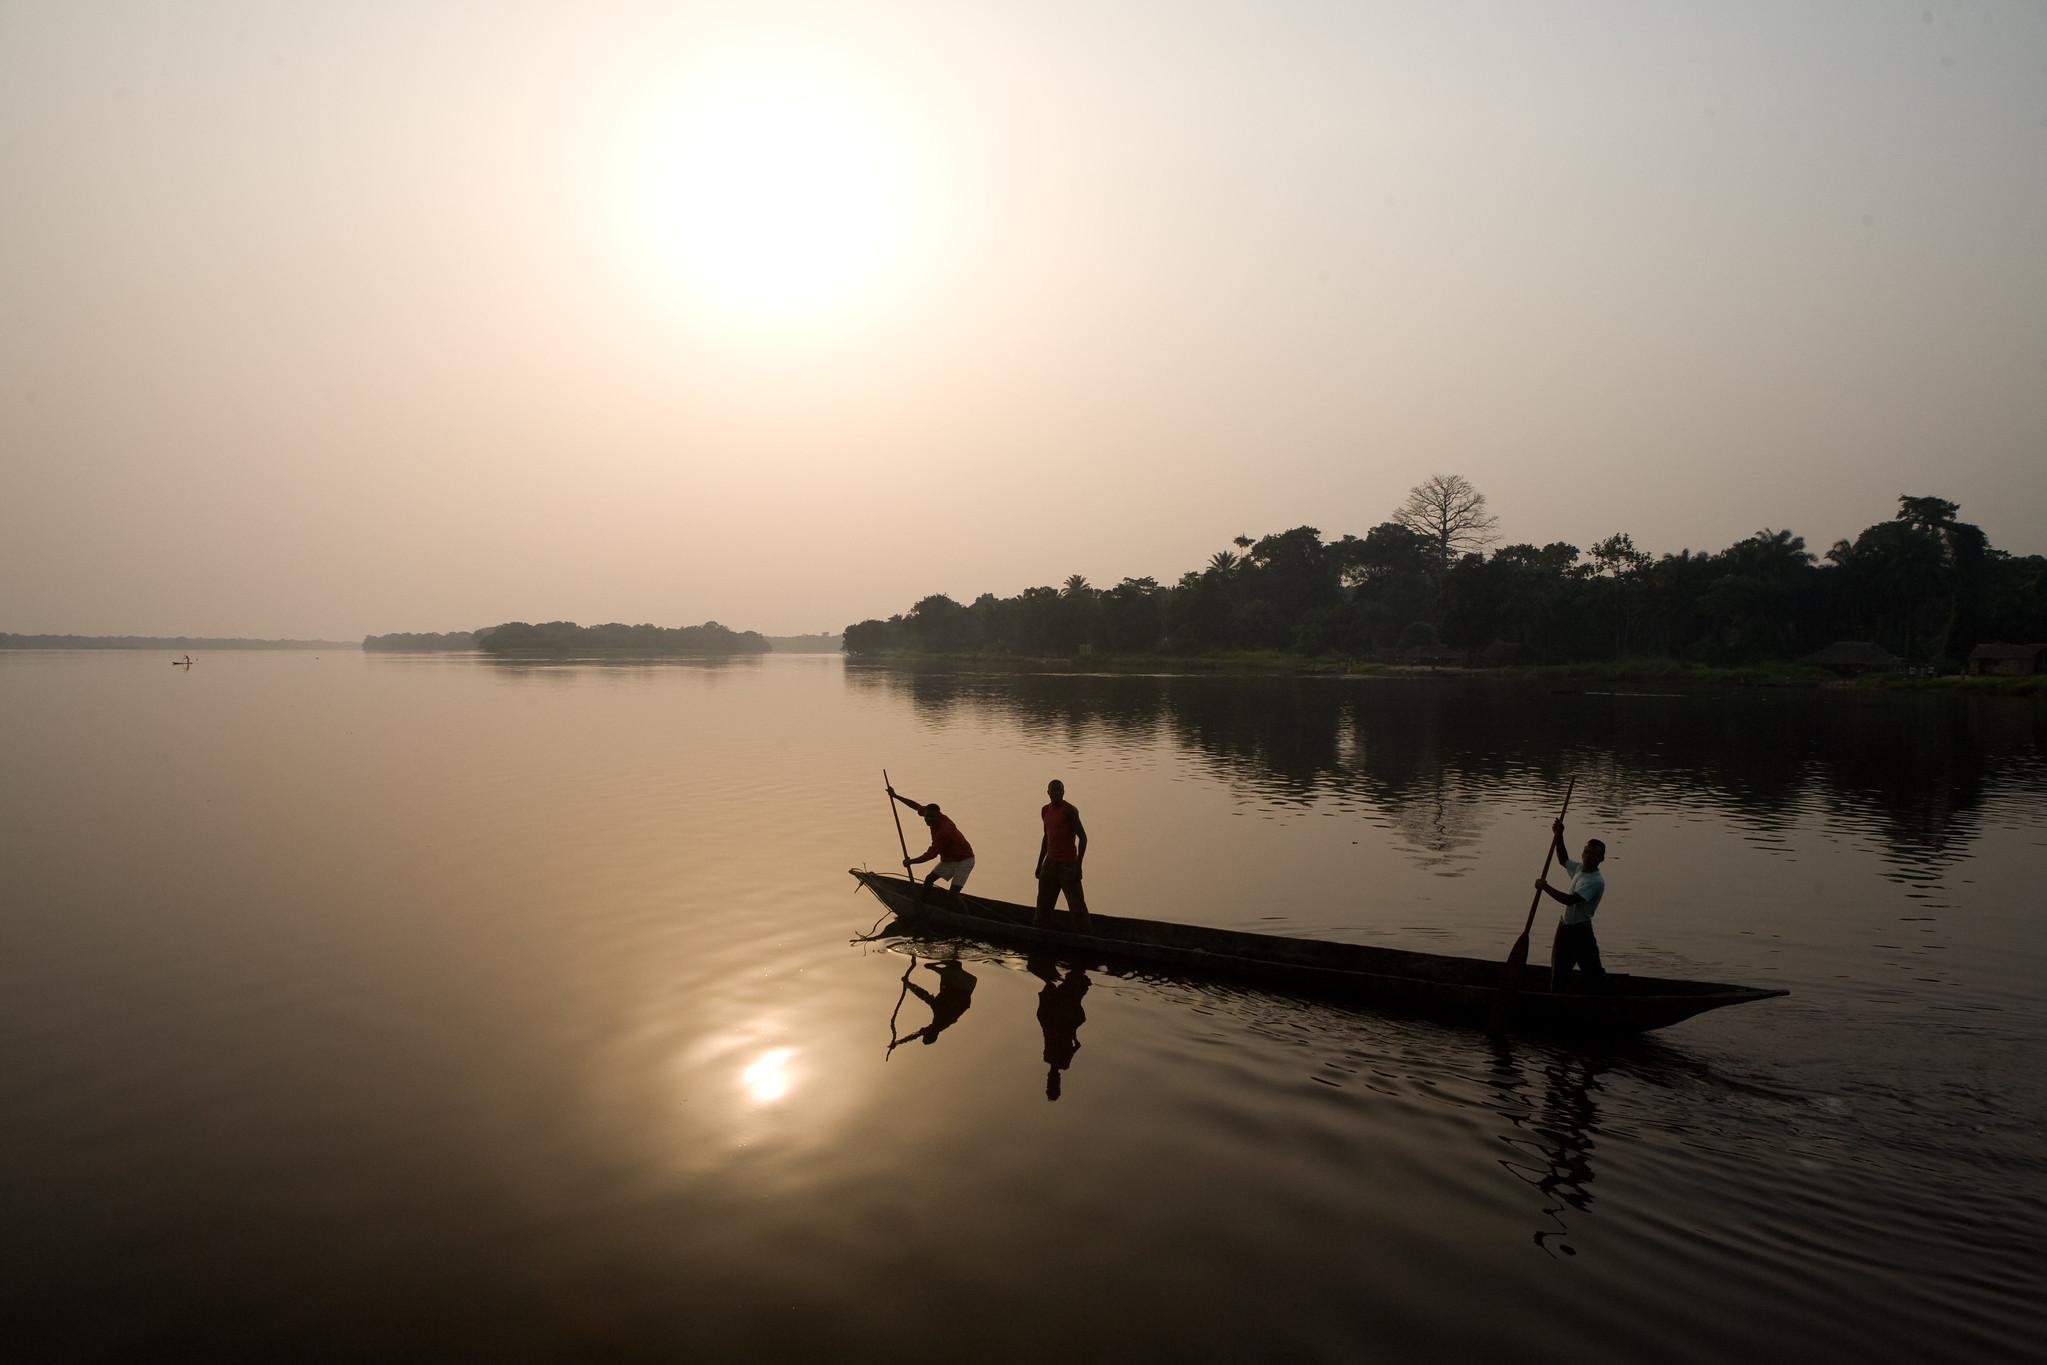 river Democratic Republic of the Congo